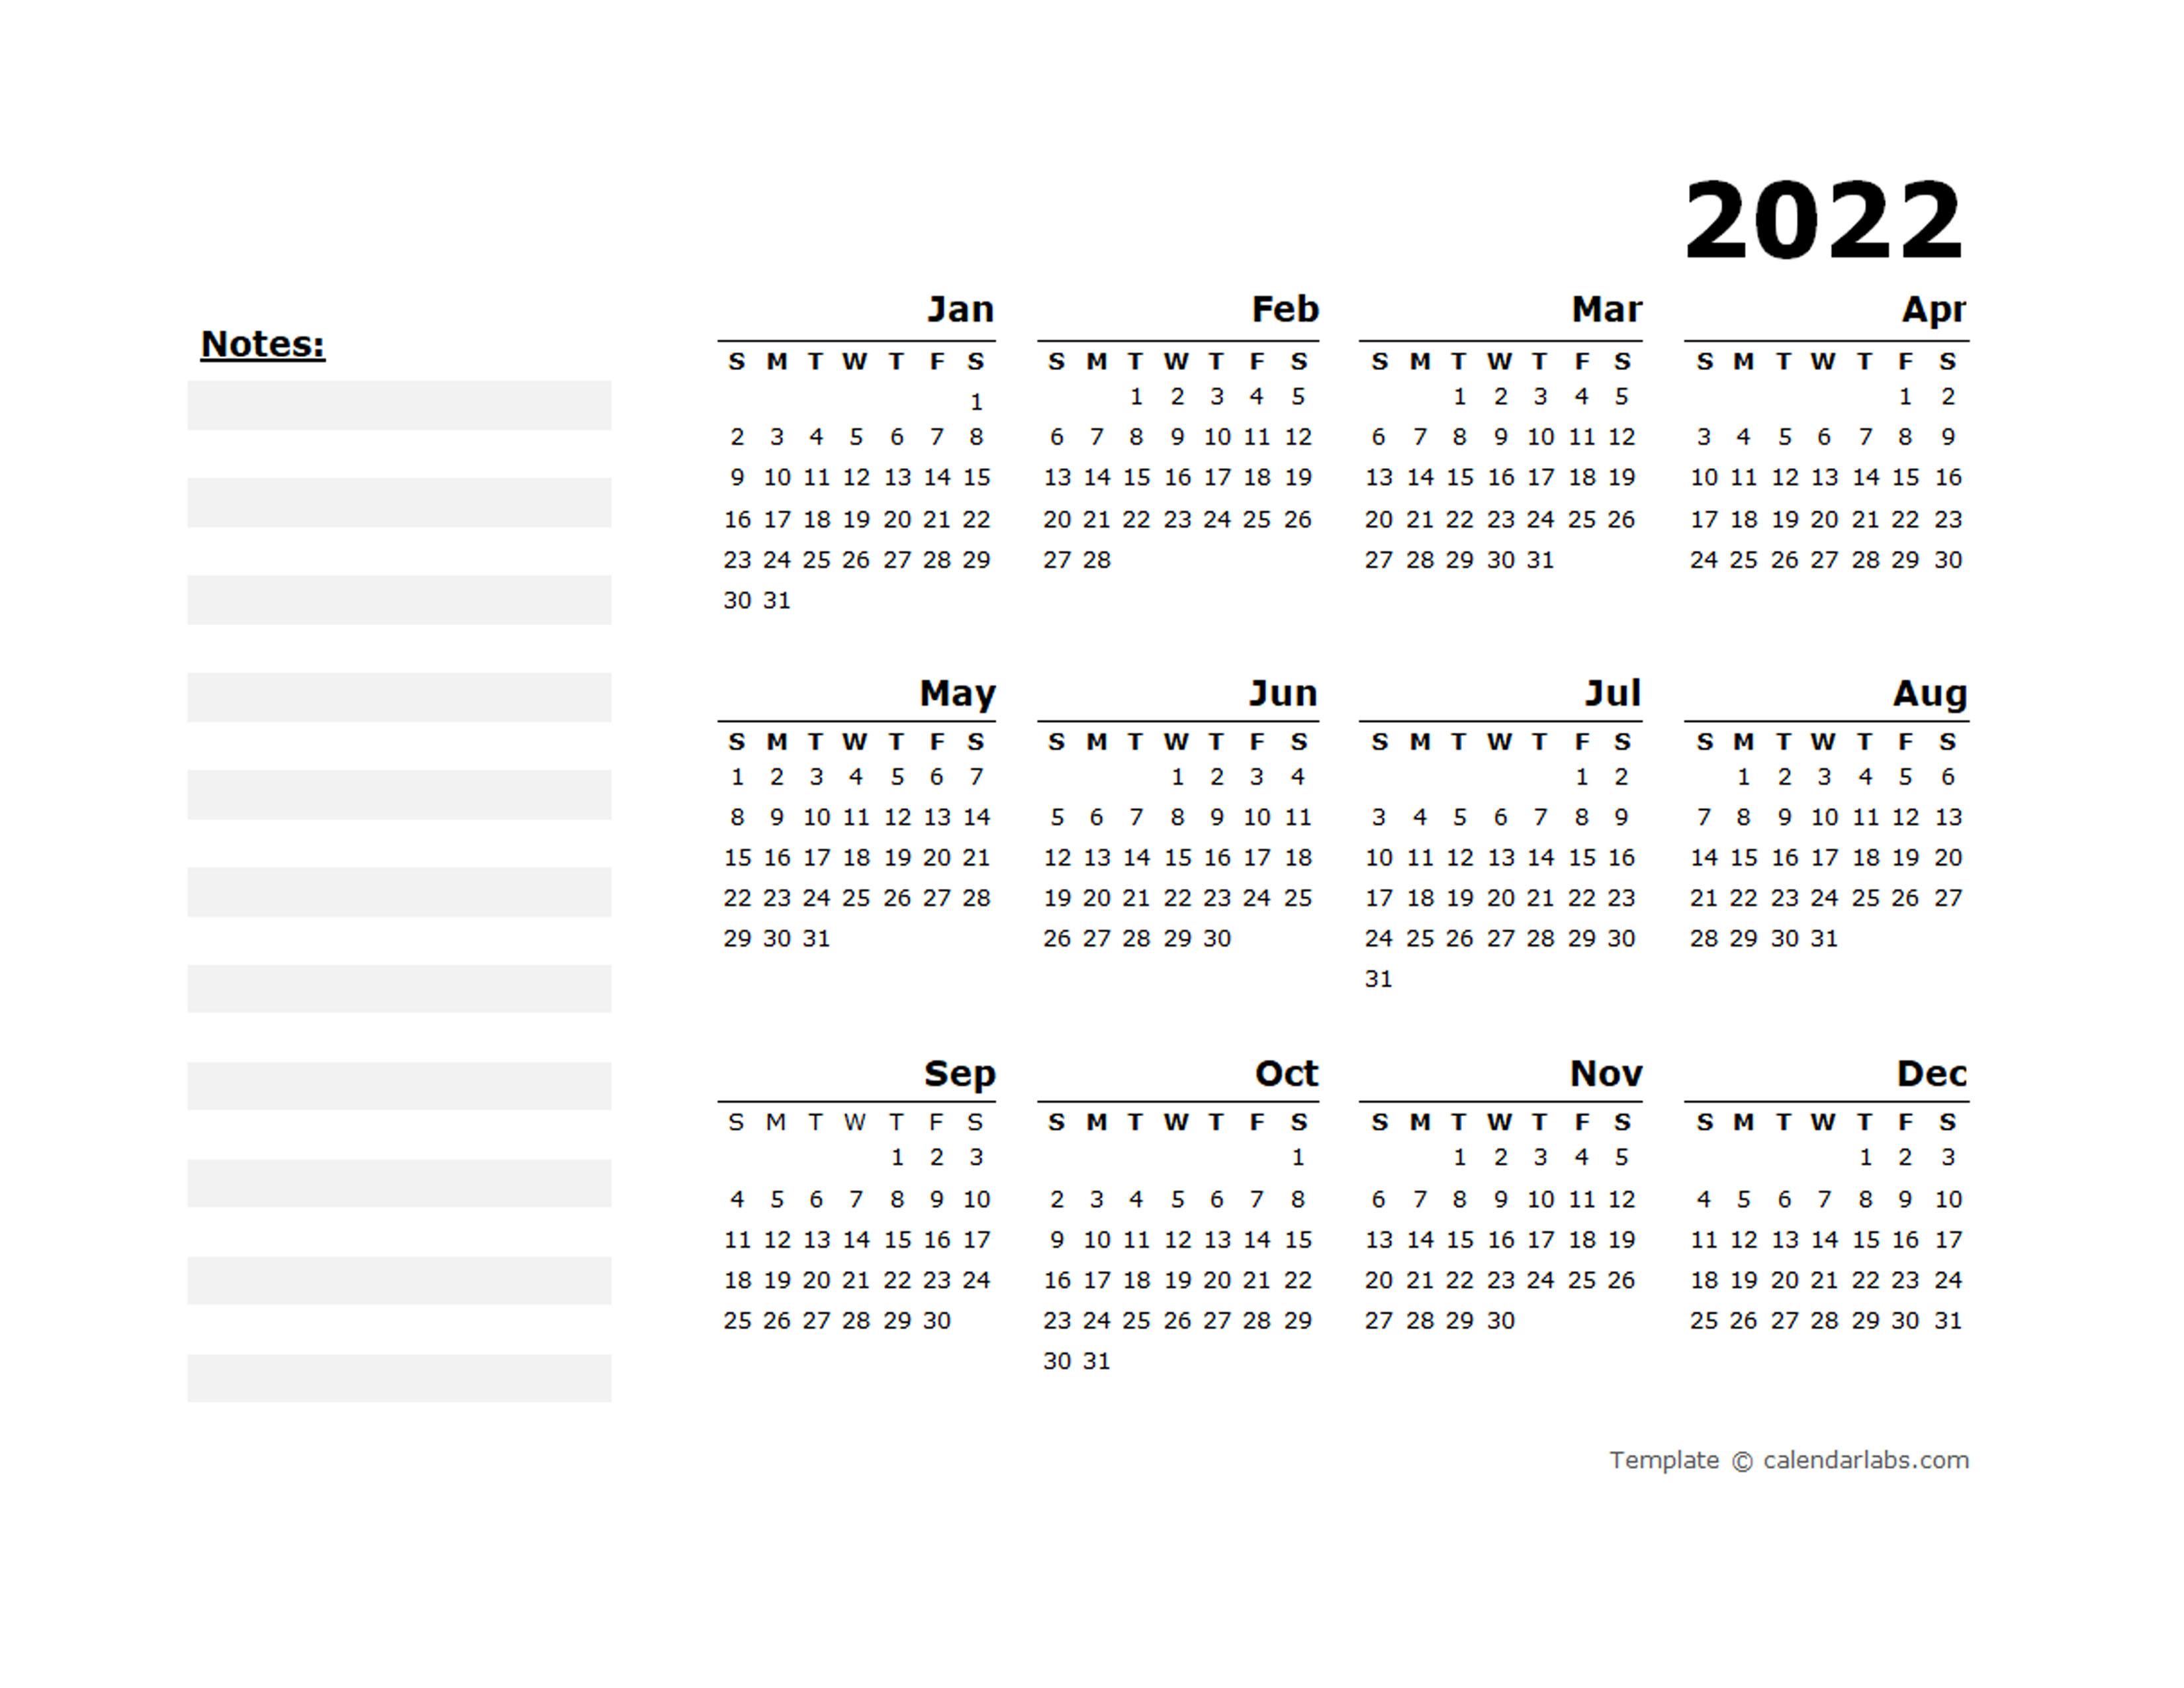 2022 Yearly Calendar Blank Minimal Design - Free Printable ...